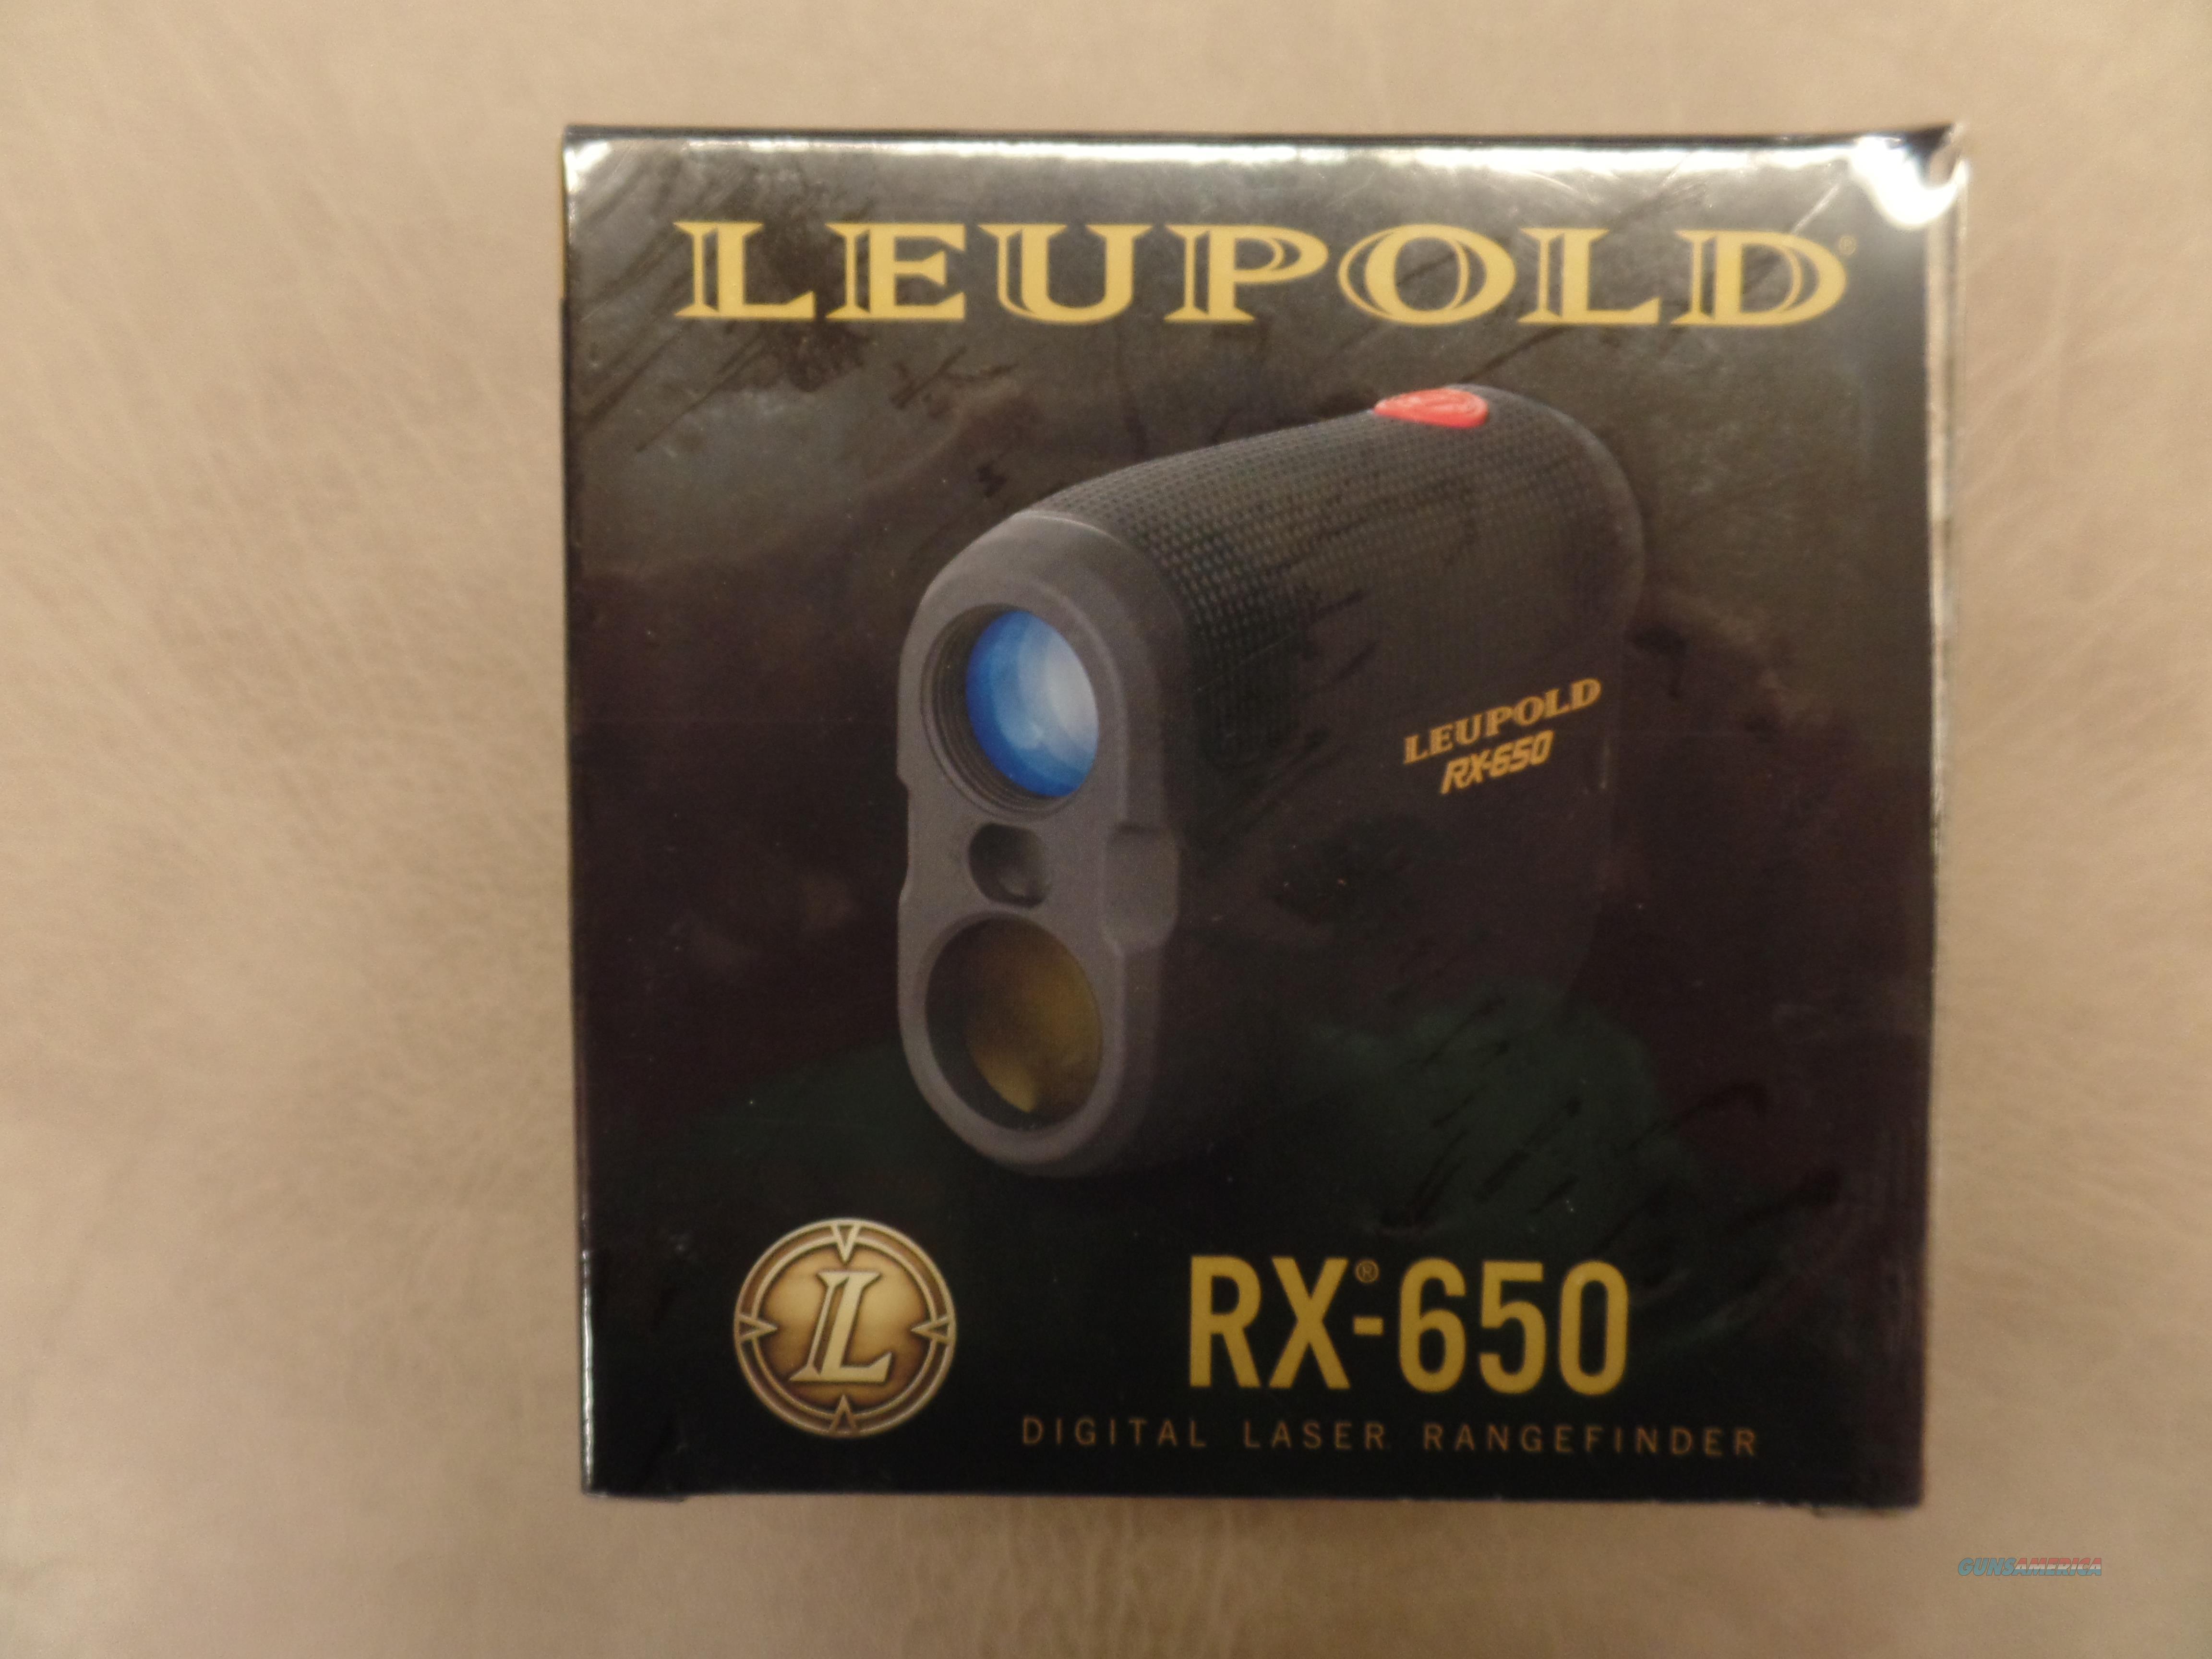 Leupold RX-650 Digital Laser Rangefinder  Non-Guns > Scopes/Mounts/Rings & Optics > Non-Scope Optics > Rangefinders